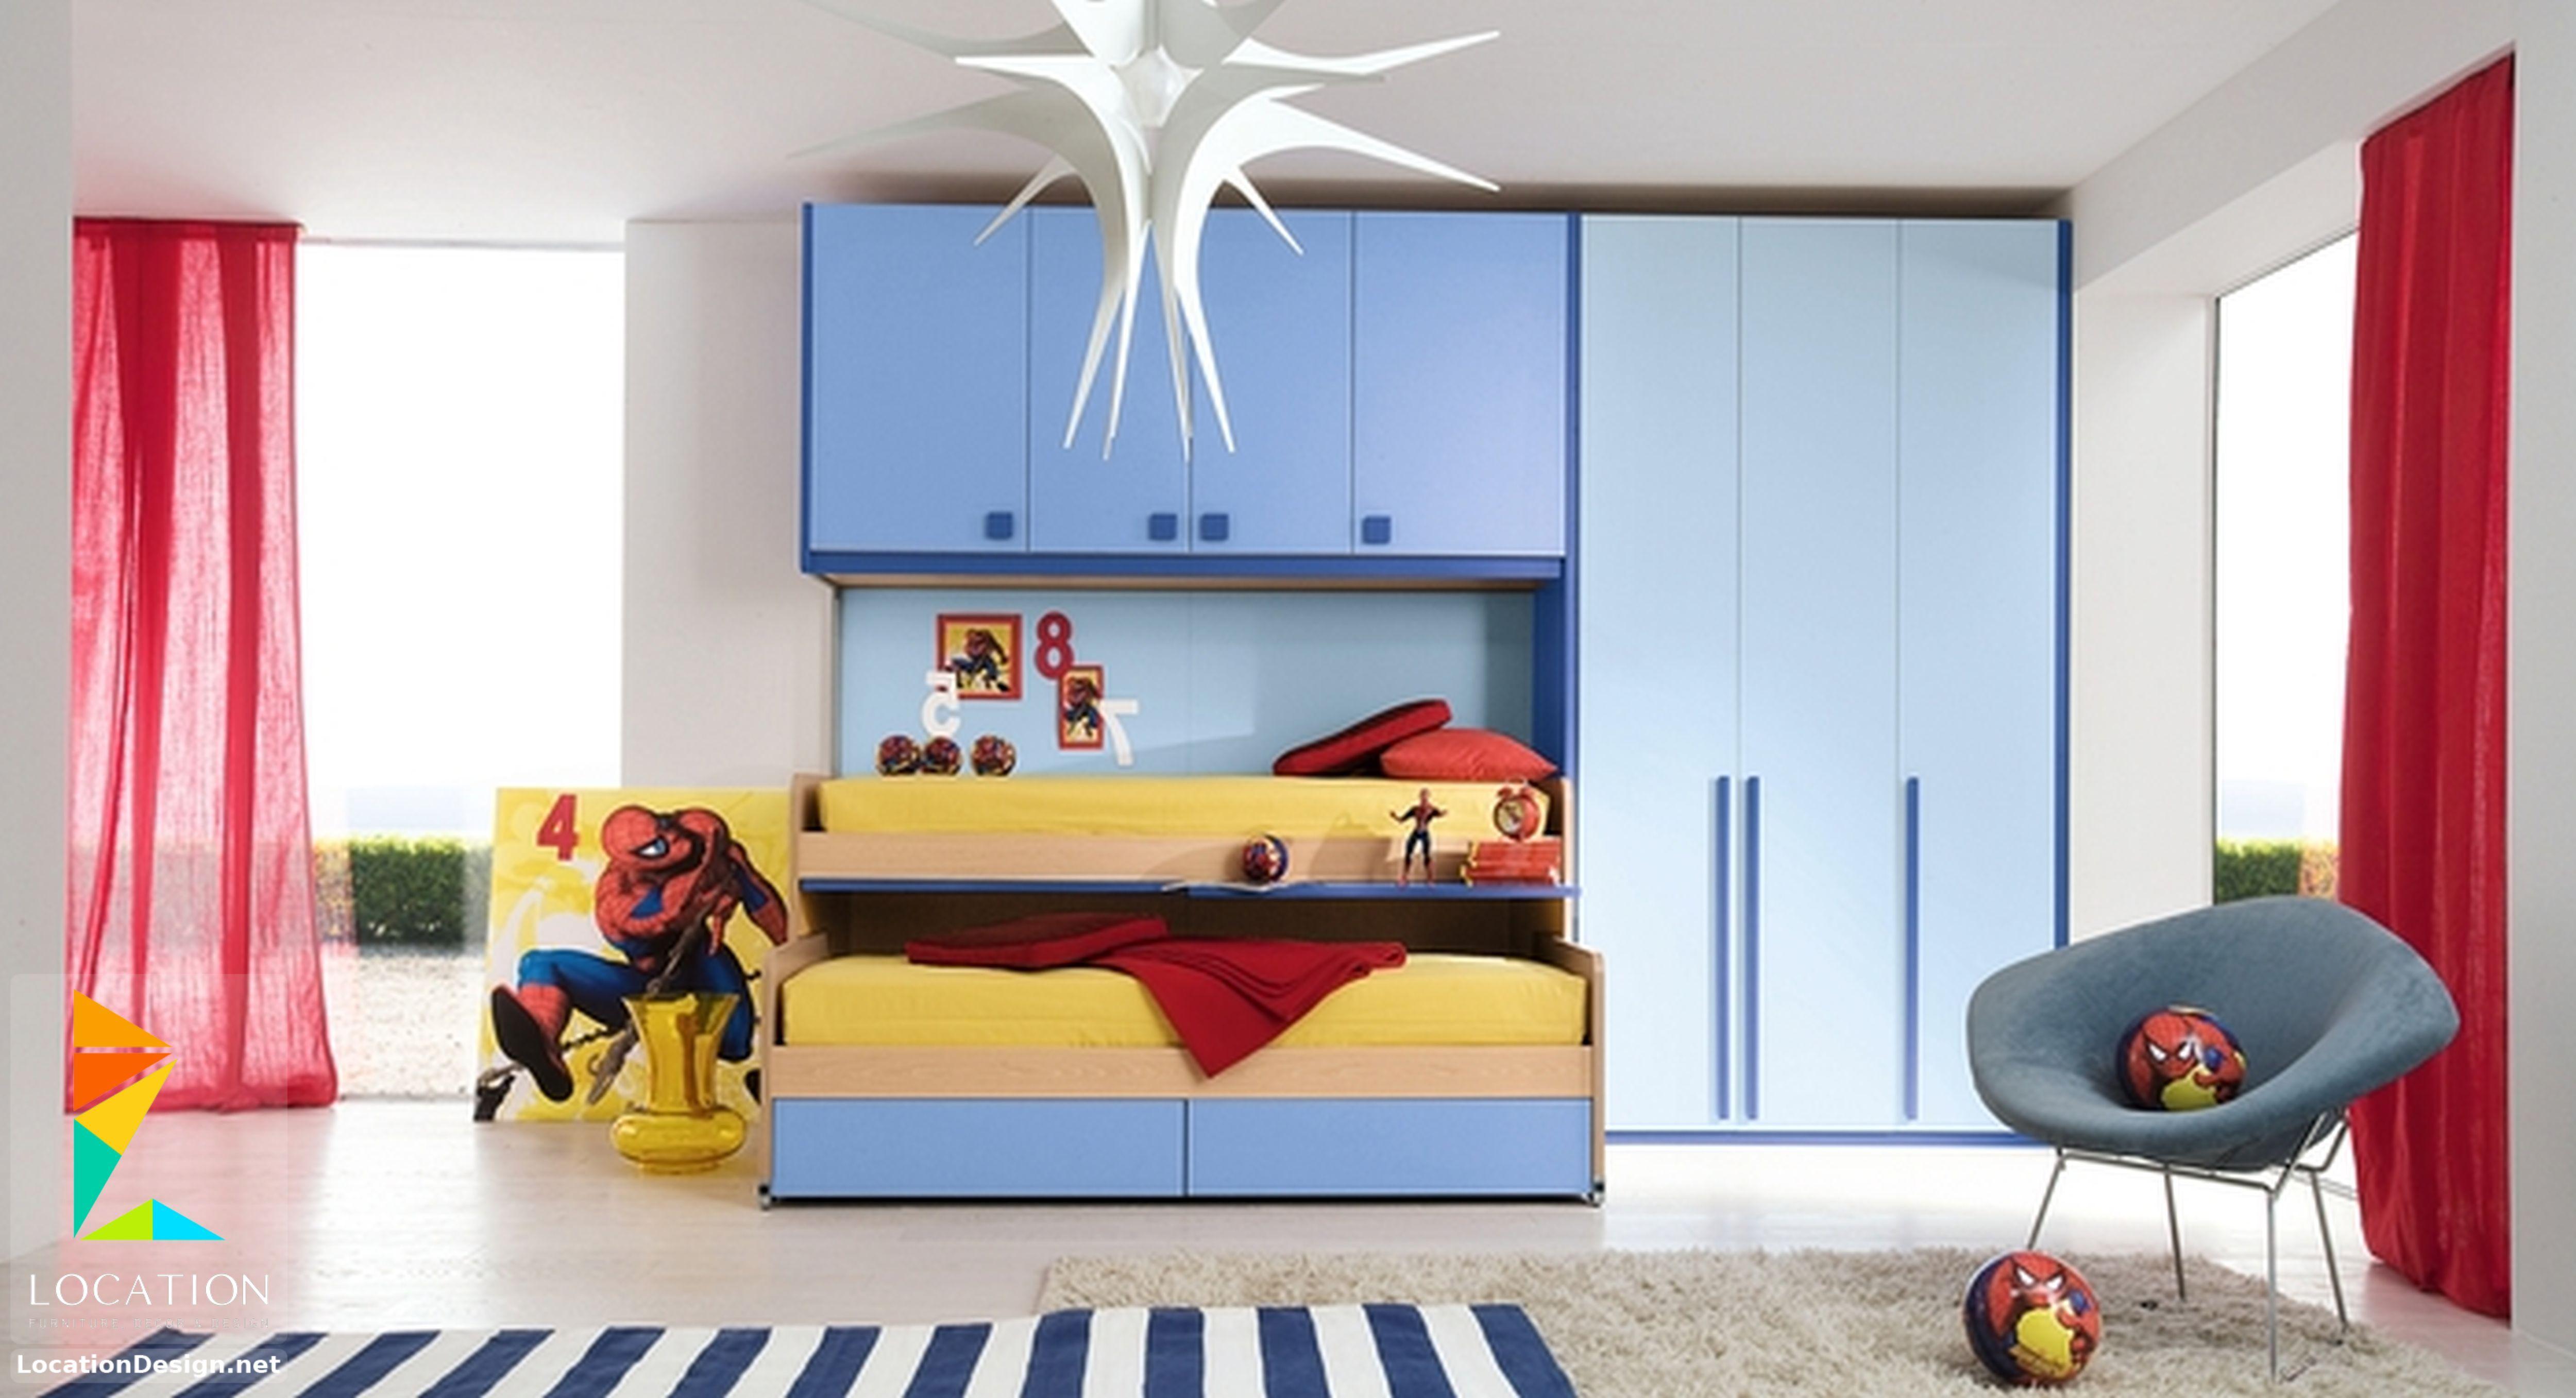 غرف نوم اولاد شباب أحدث موديلات غرف شبابي مودرن لوكشين ديزين نت Cool Bedrooms For Boys Boys Bedroom Decor Boy Bedroom Design